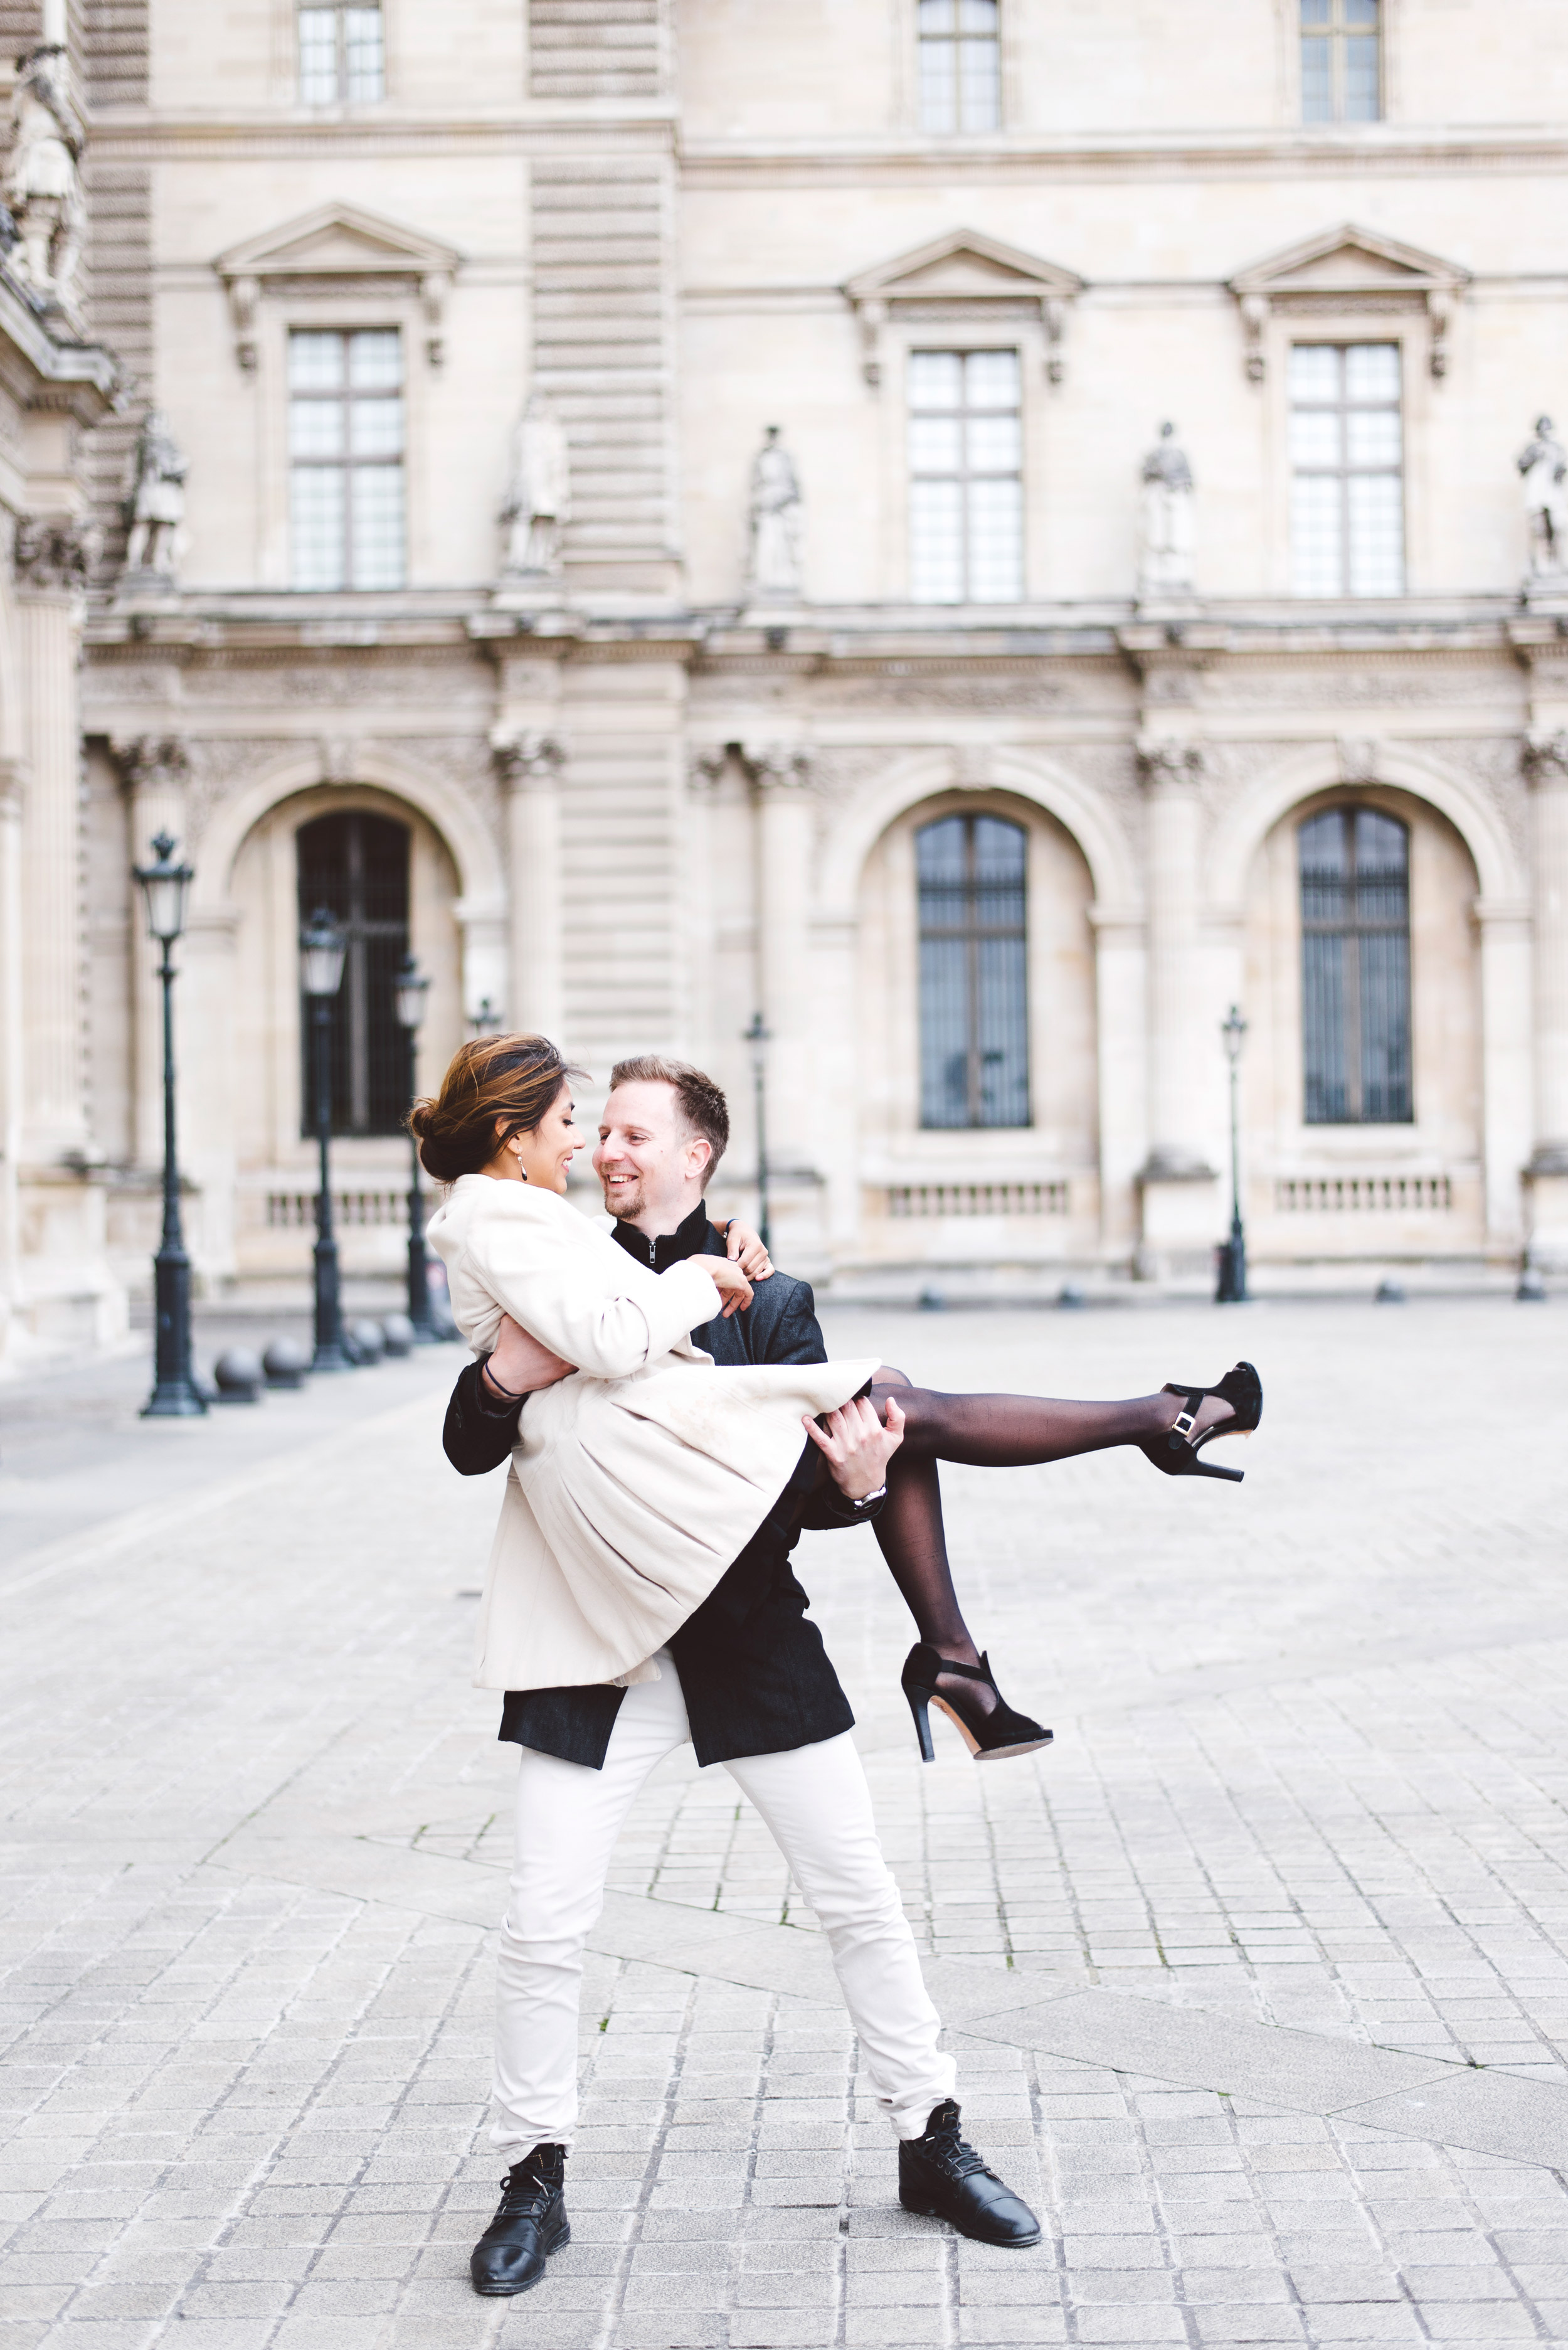 Couple-photoshoot-Anniversary-Paris-Louvre-Tuileries085.jpg